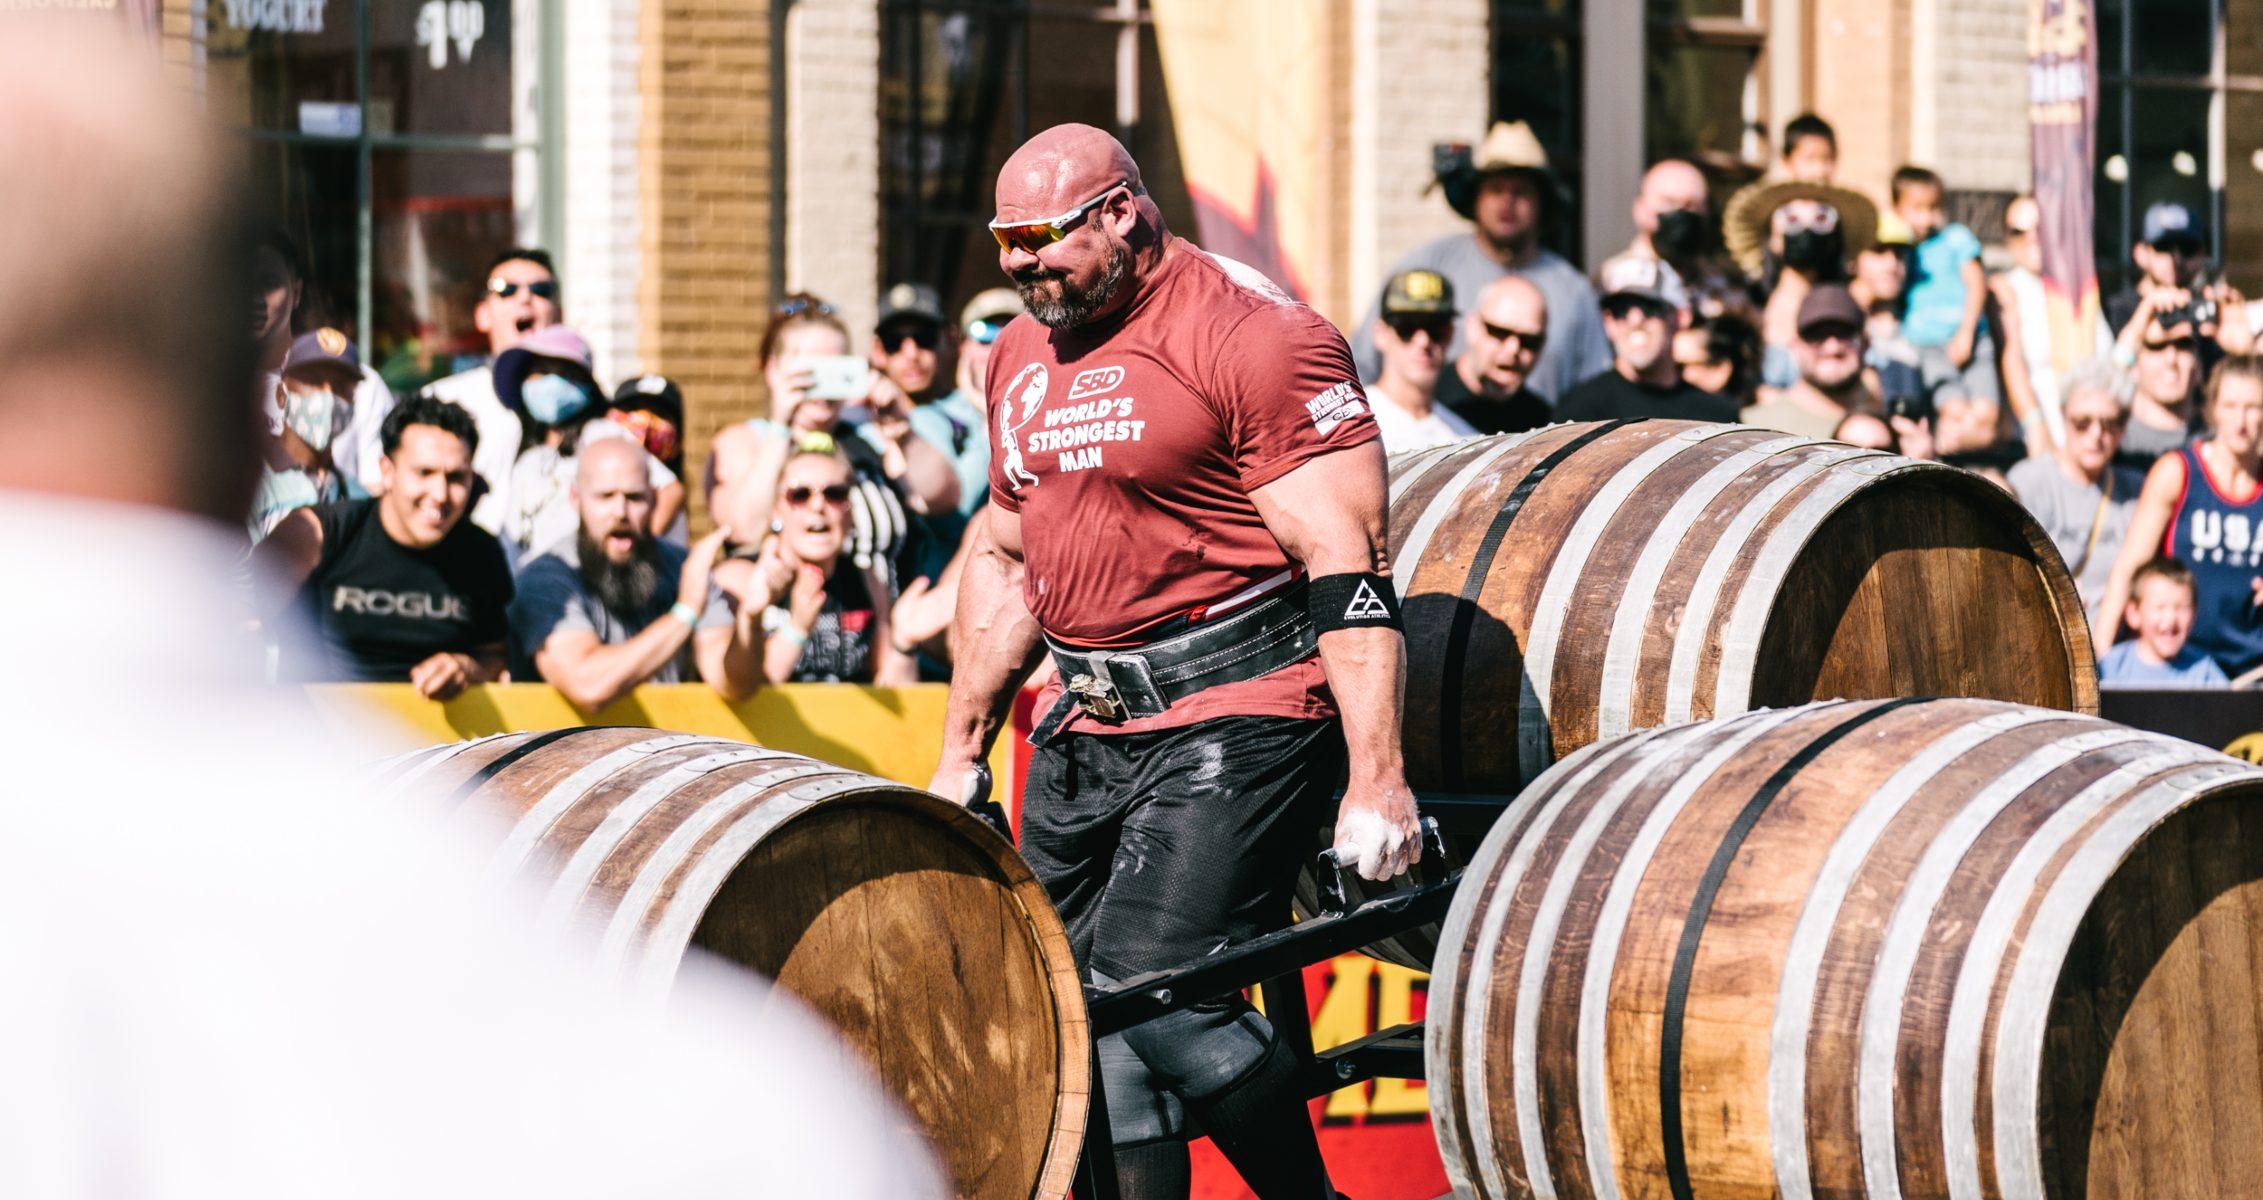 world's strongest man 2021 - photo #1